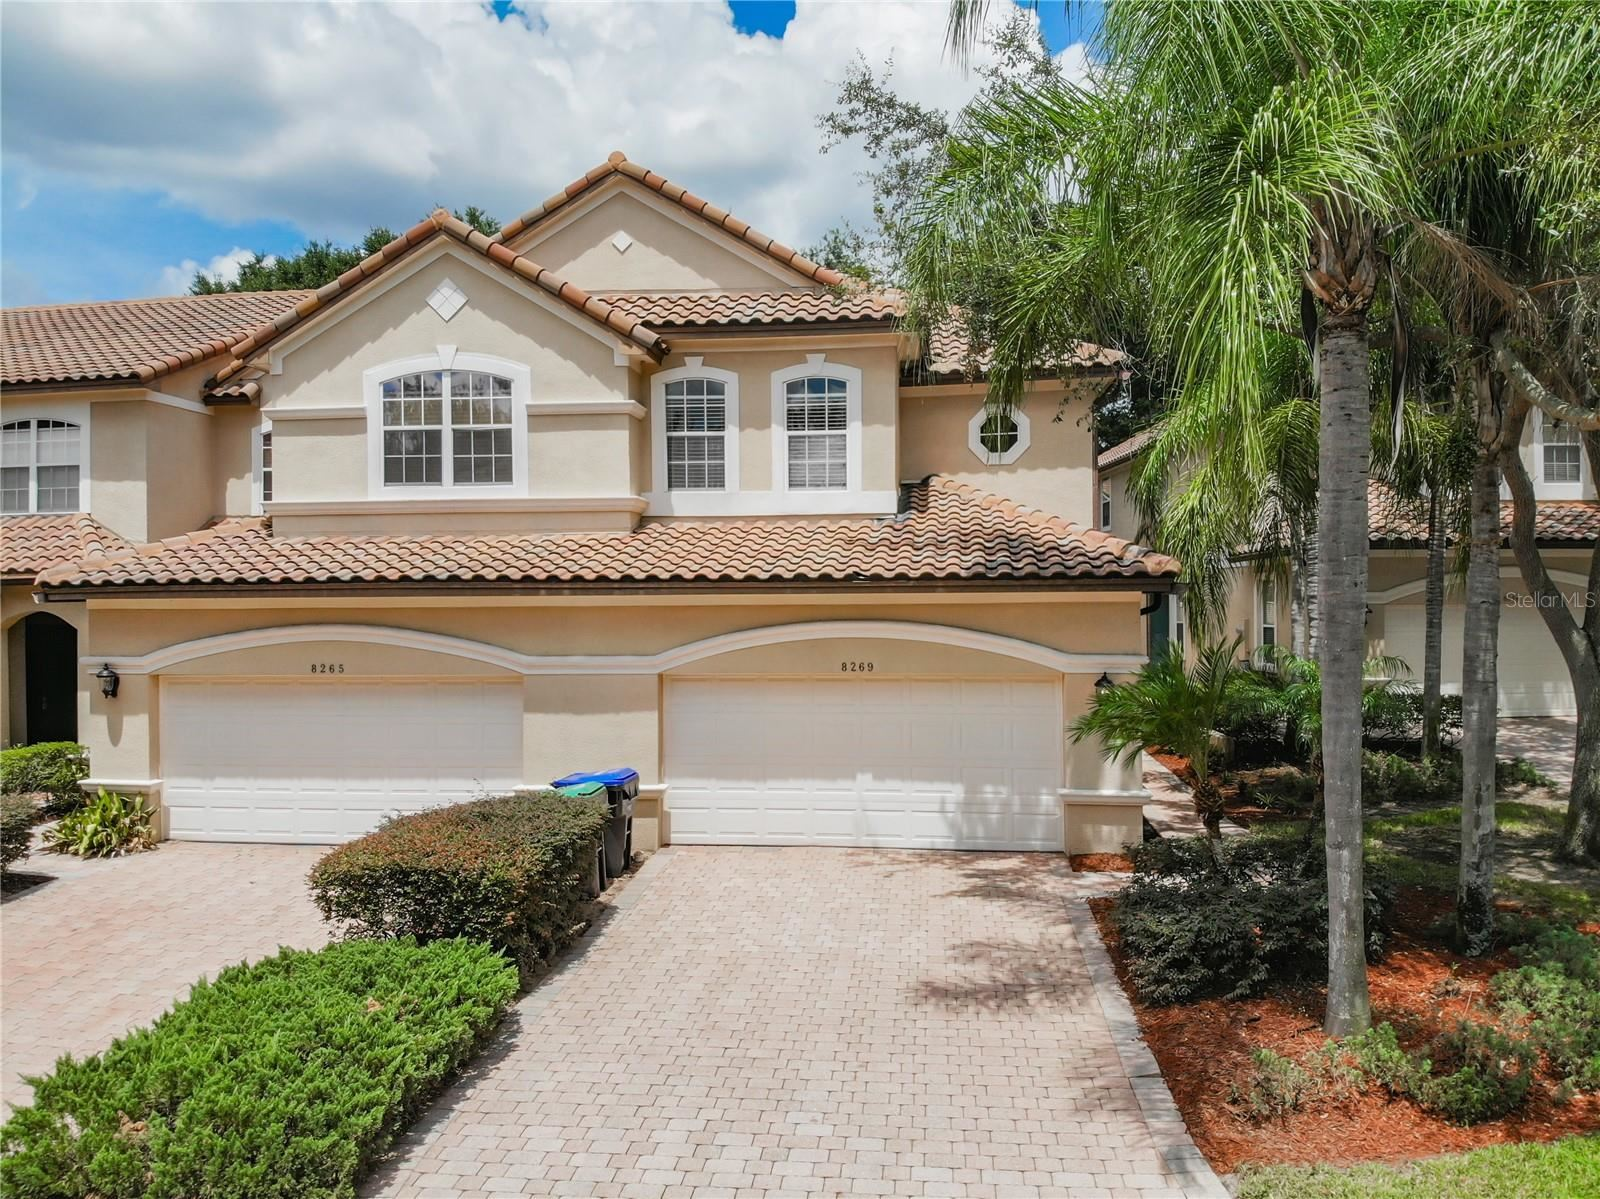 8269 TIVOLI DRIVE, Orlando, FL 32836 - #: O5951501